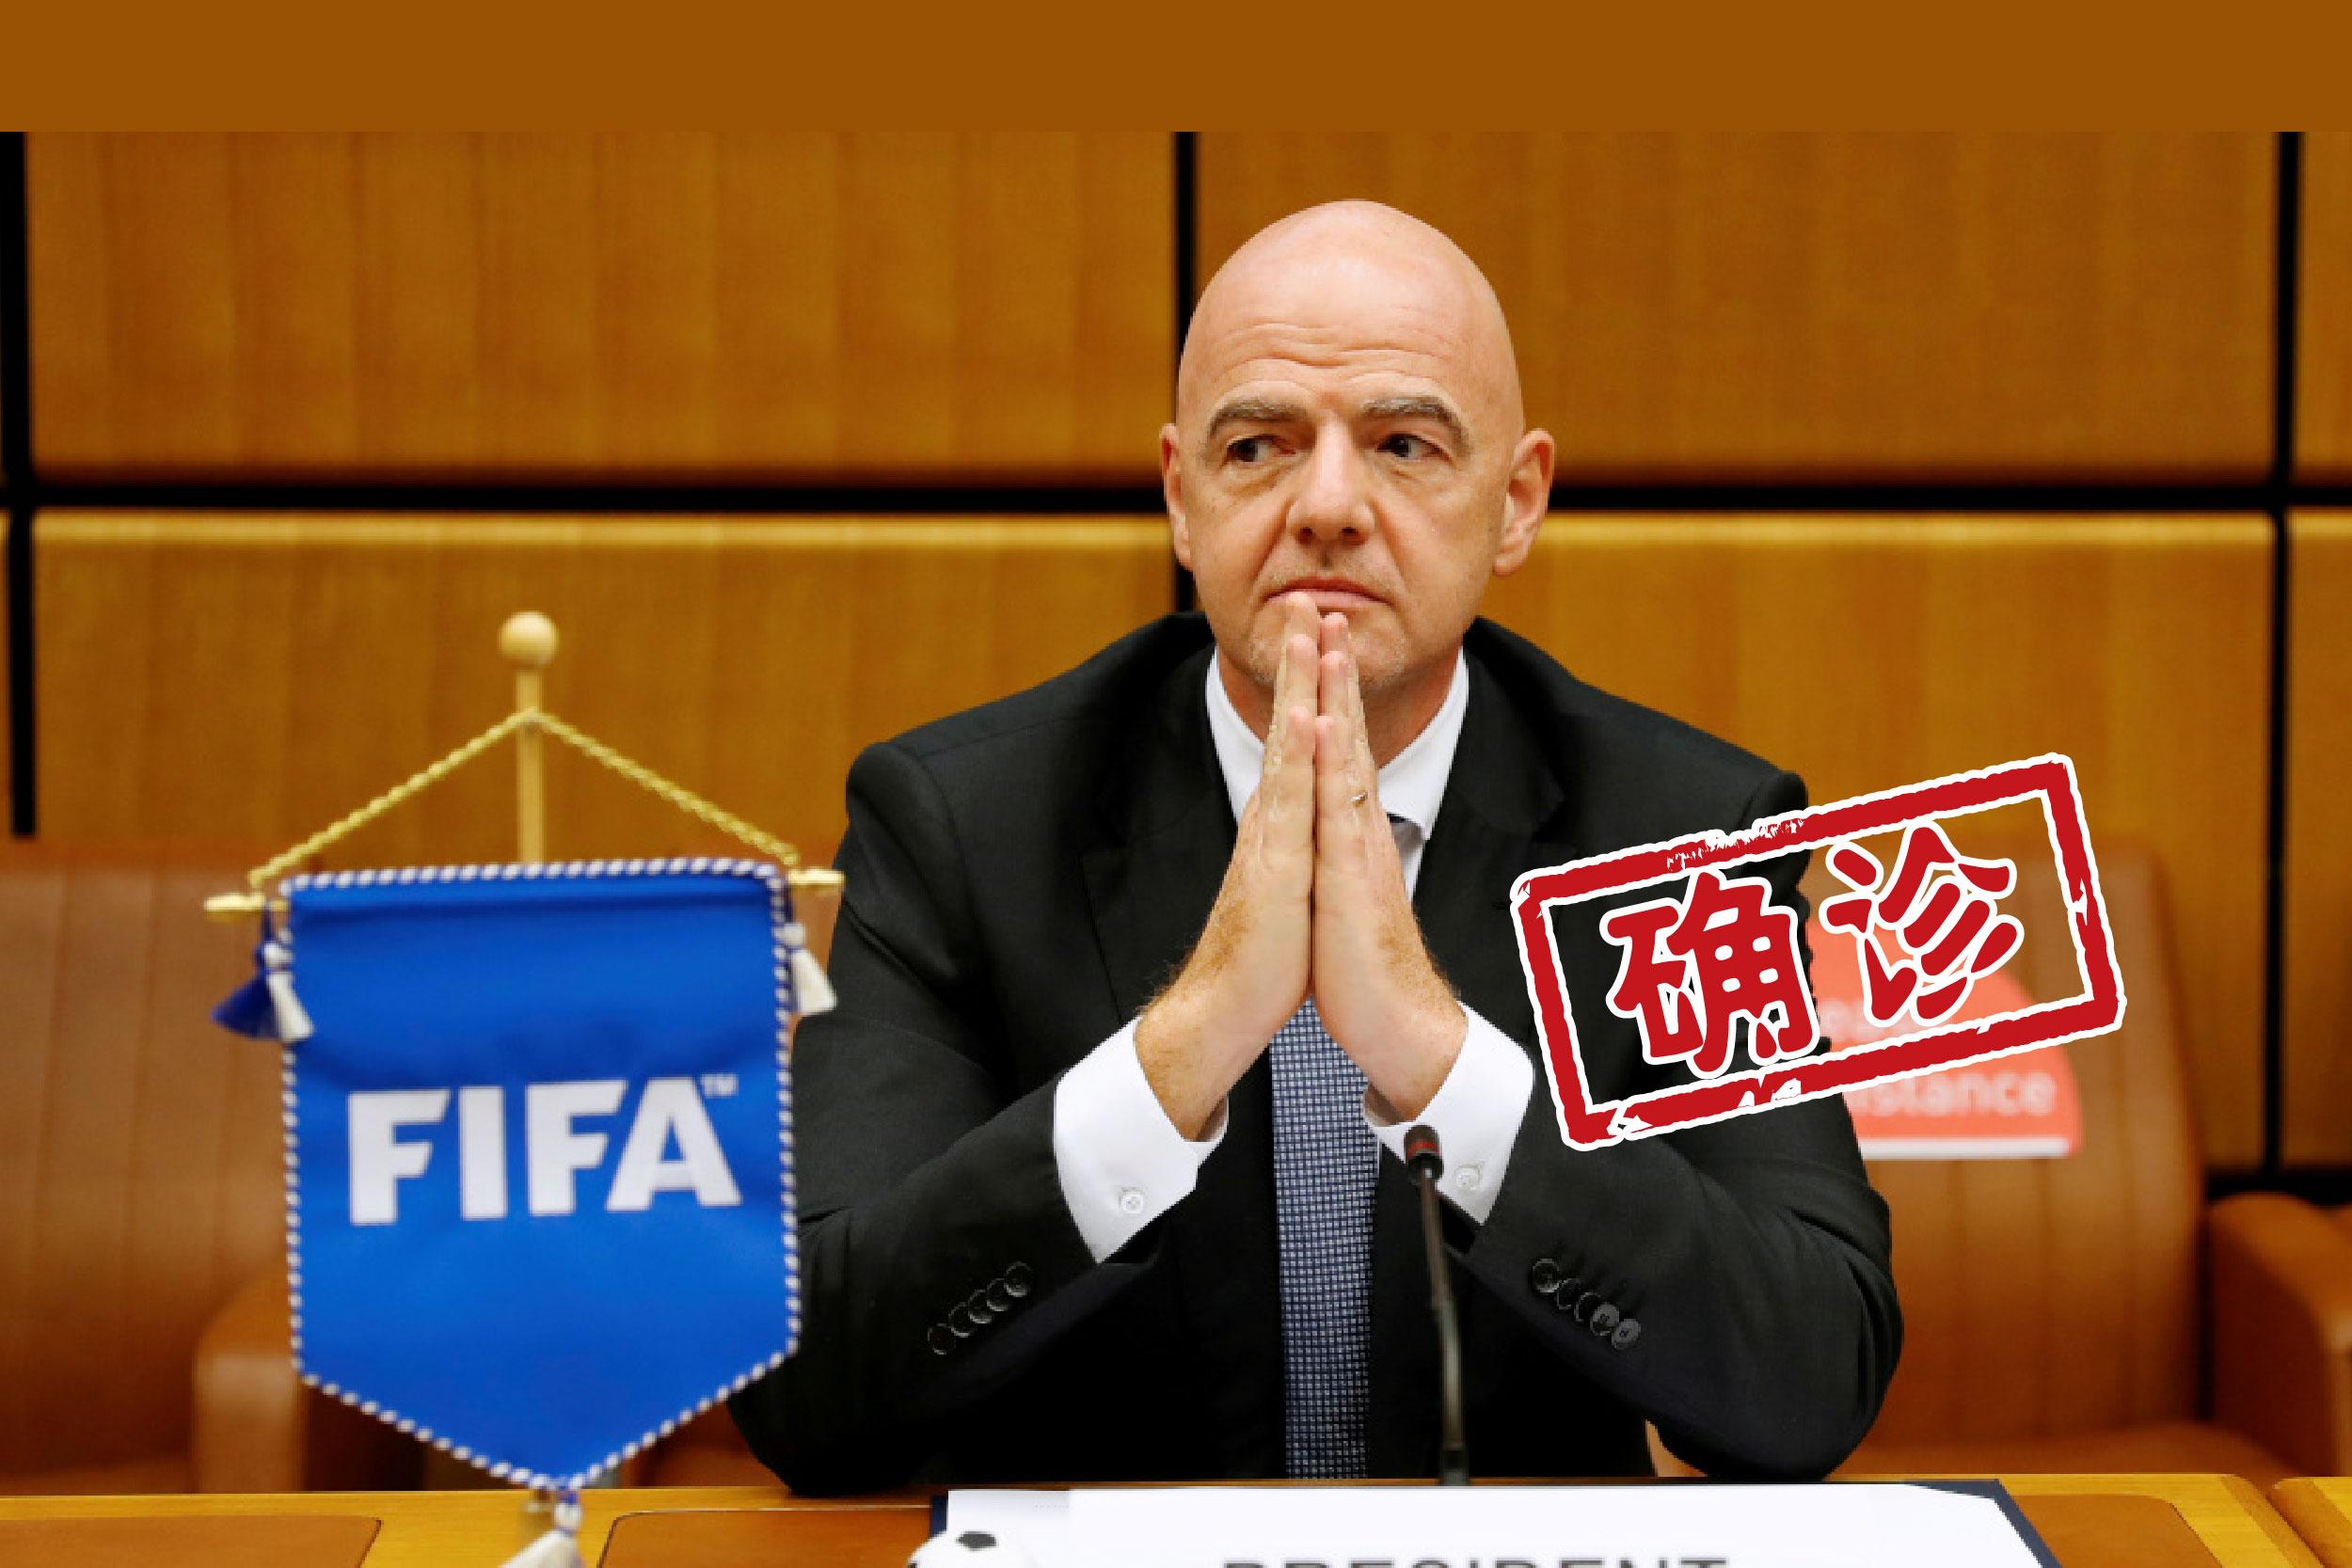 FIFA官网宣布主席因凡蒂诺新型冠状病毒(Covid-19)检测呈阳性。-路透社/精彩大马制图-